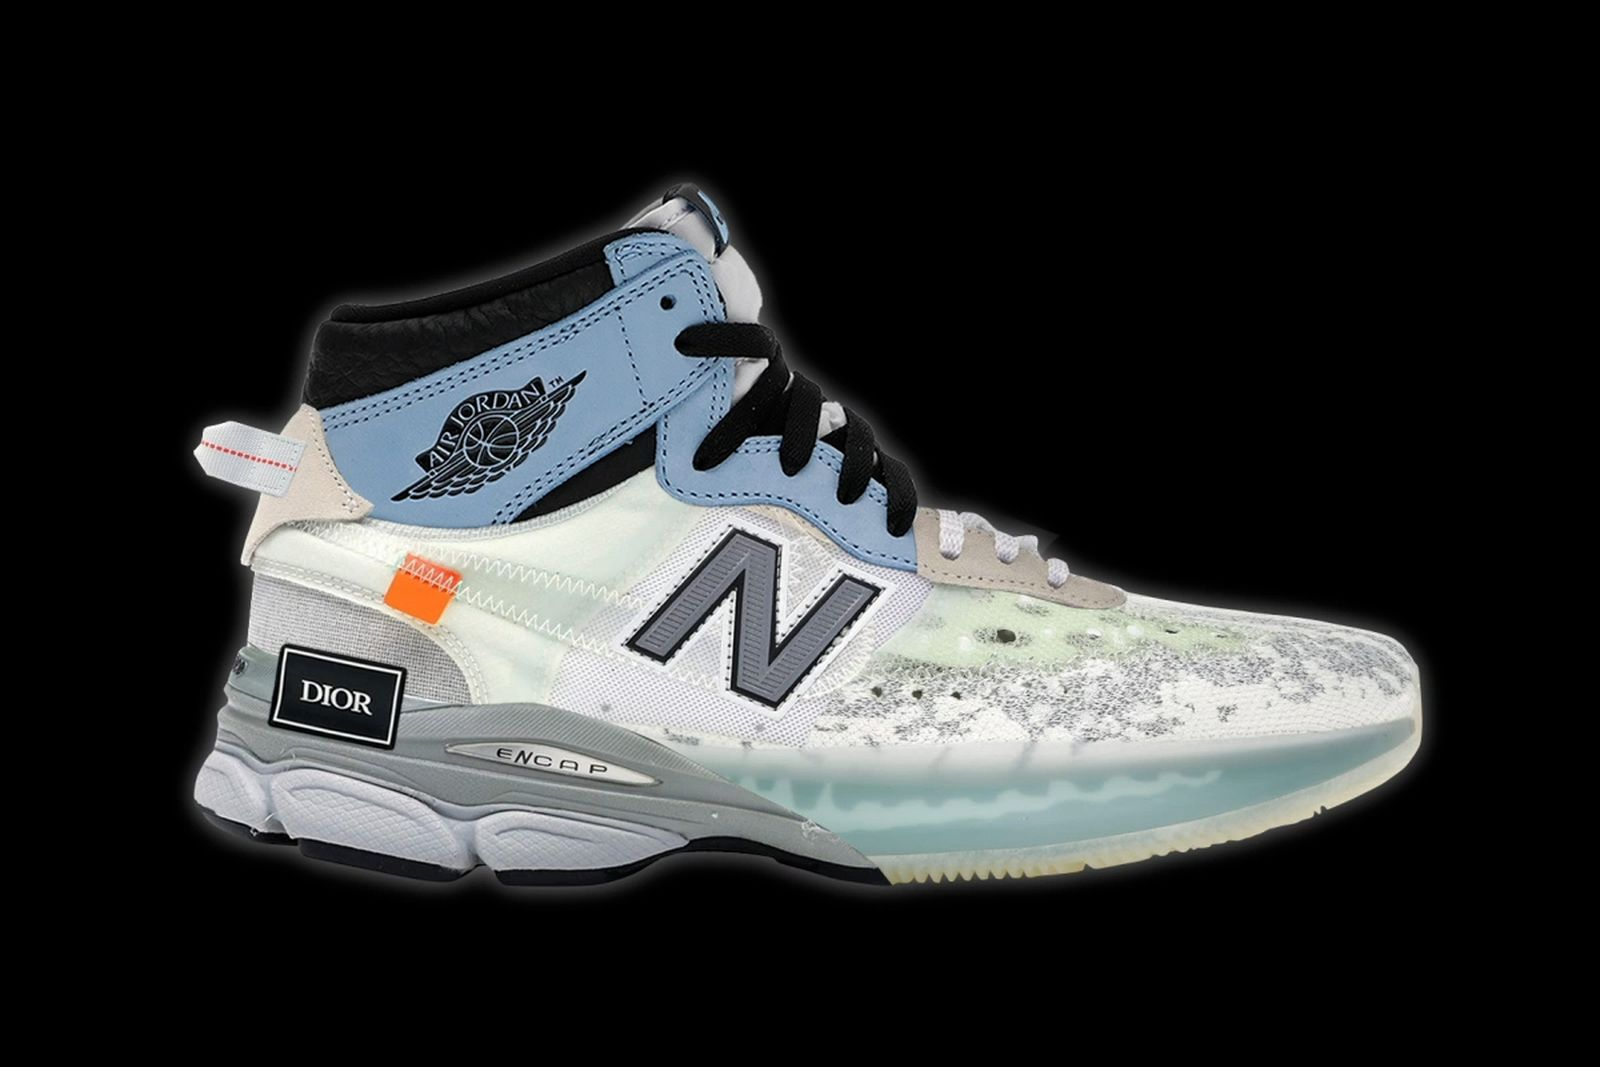 sneaker-collaboration-worth-01